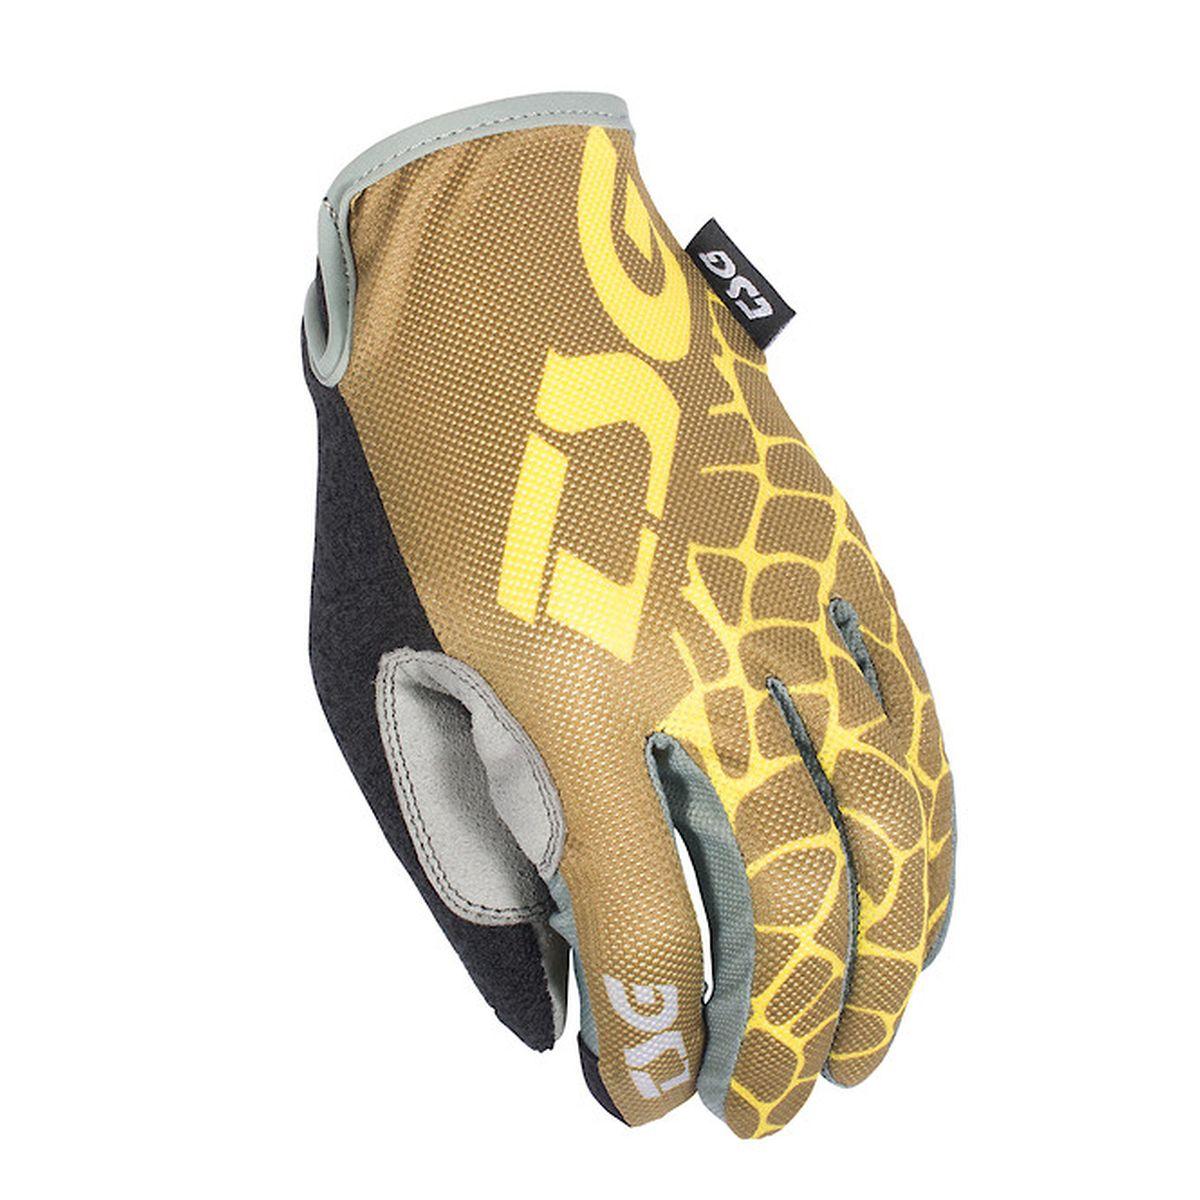 Rękawiczki TSG Hunter AK3